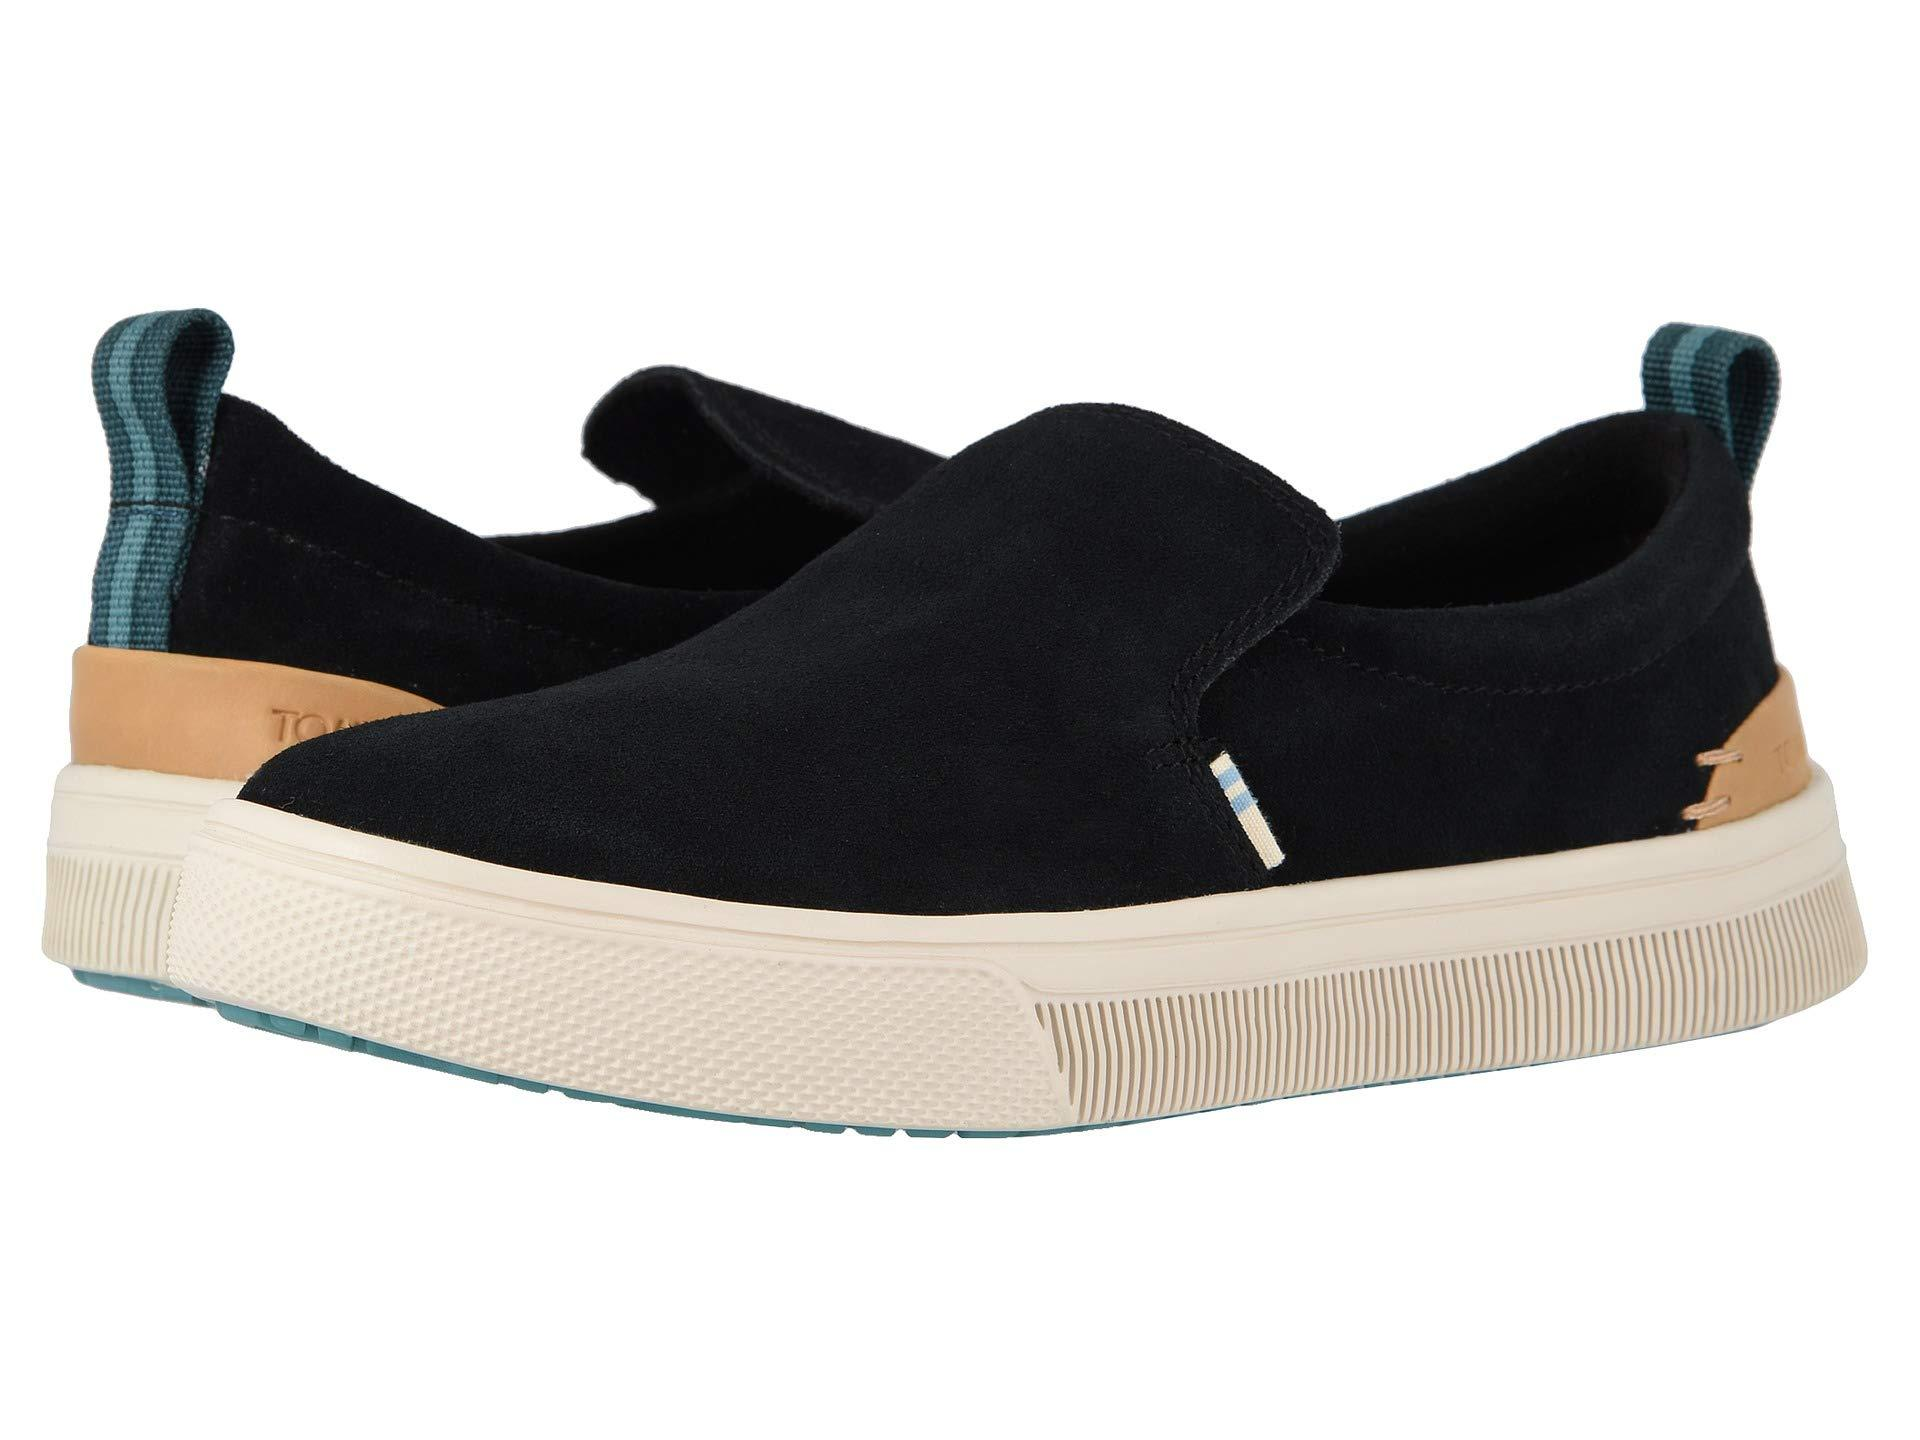 565a75bcd6f Lyst - TOMS Trvl Lite Slip-on (birch Canvas) Women s Shoes in Black